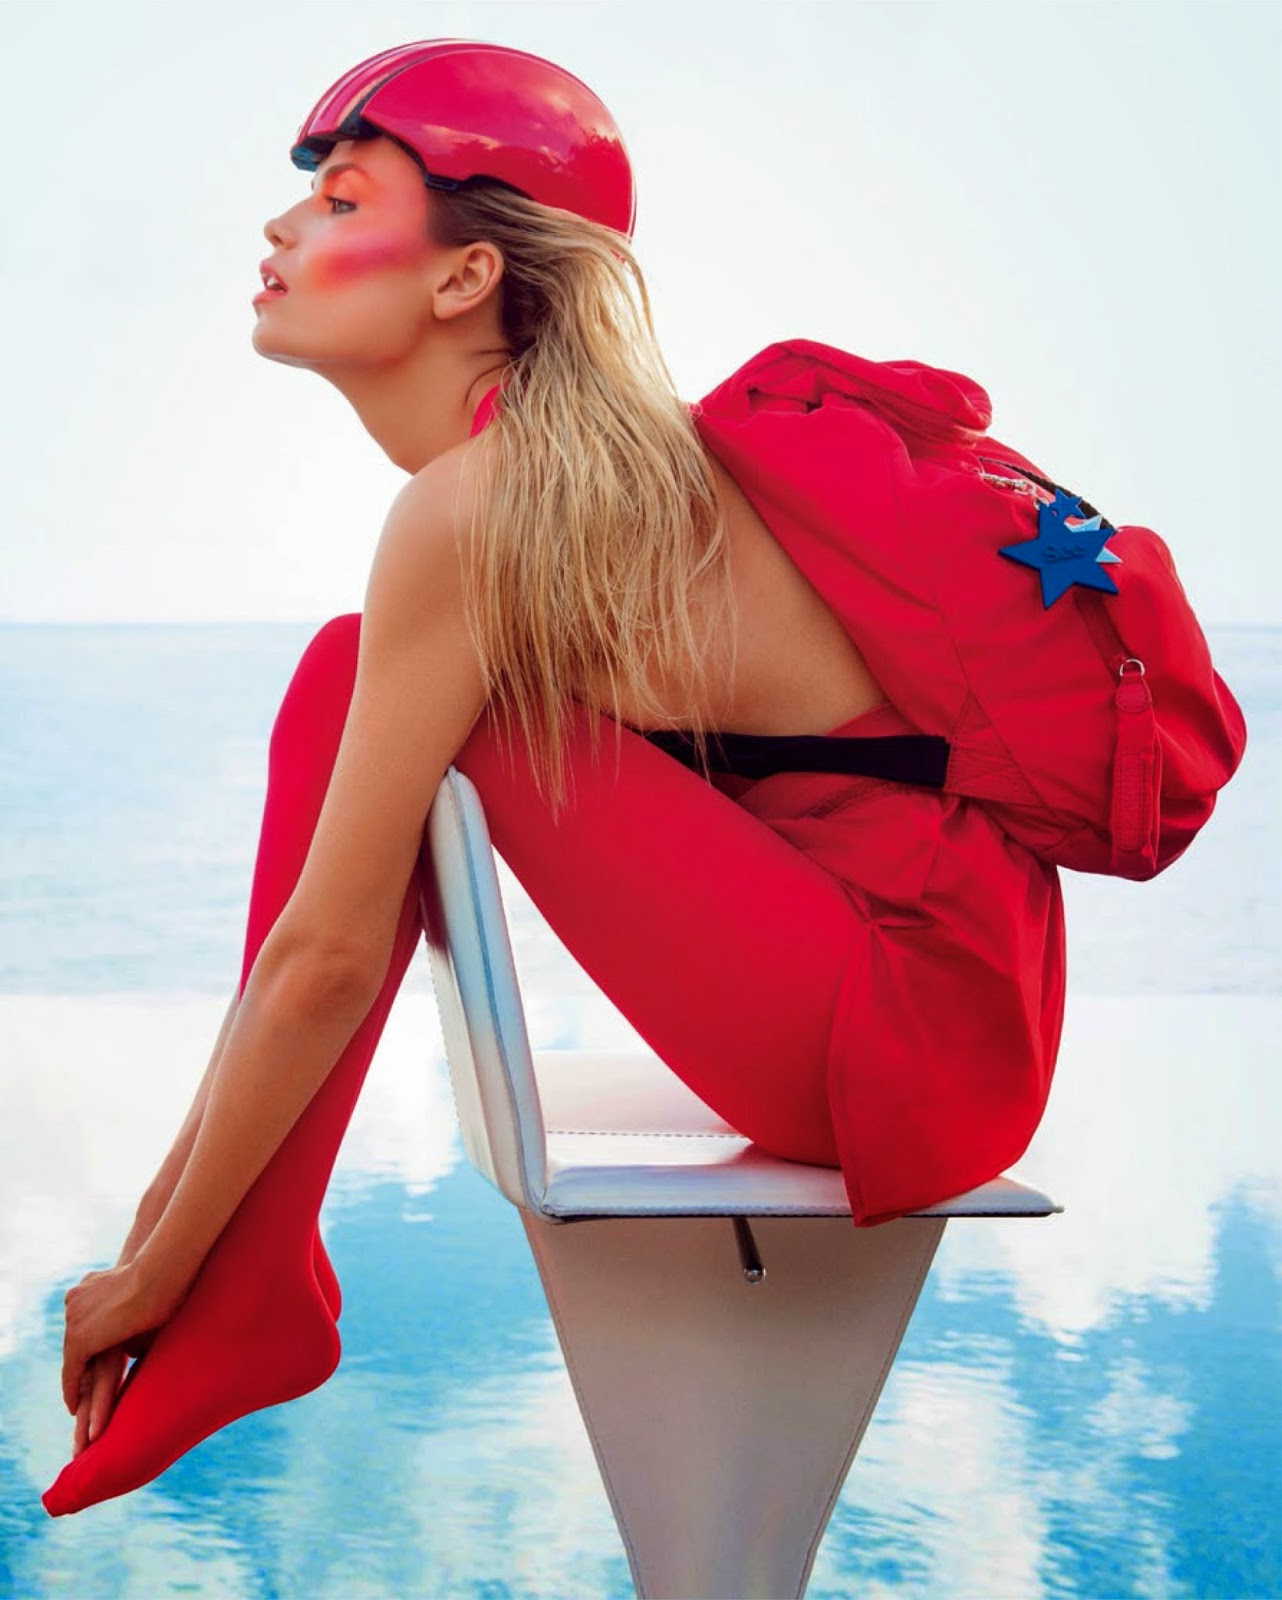 Natasha Poly by Inez Van Lamsweerde & Vinoodh Matadin For Vogue Paris Magazine, June /July 2014